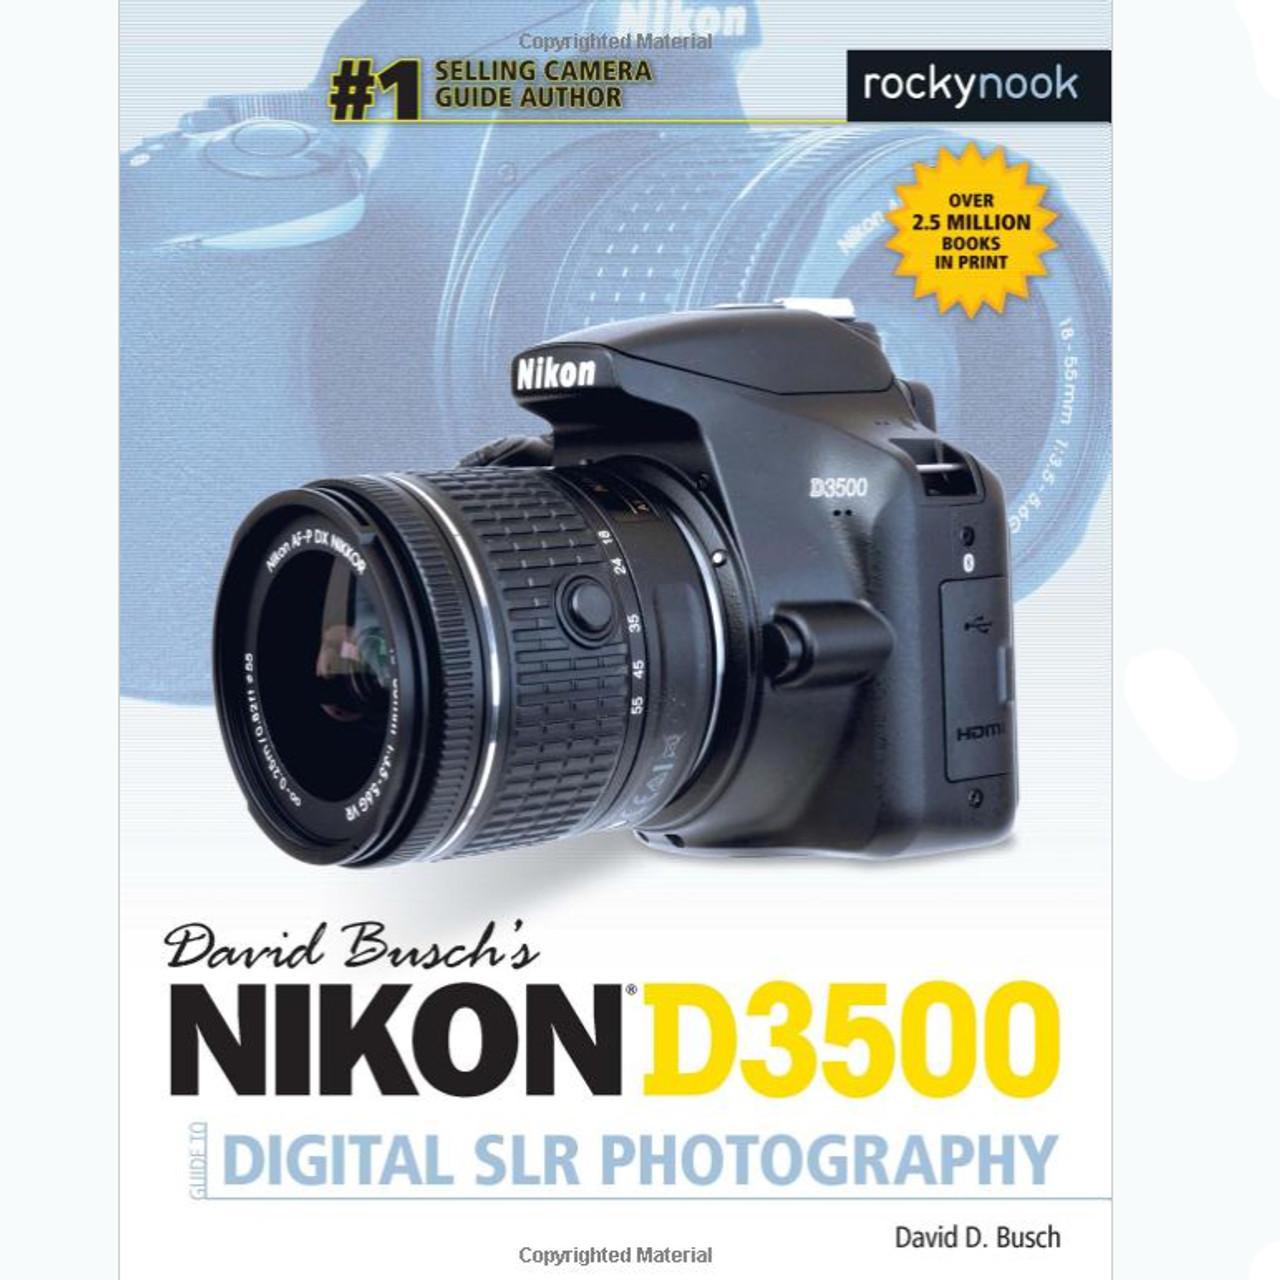 DAVID BUSCH'S NIKON D3500 GUIDE BOOK